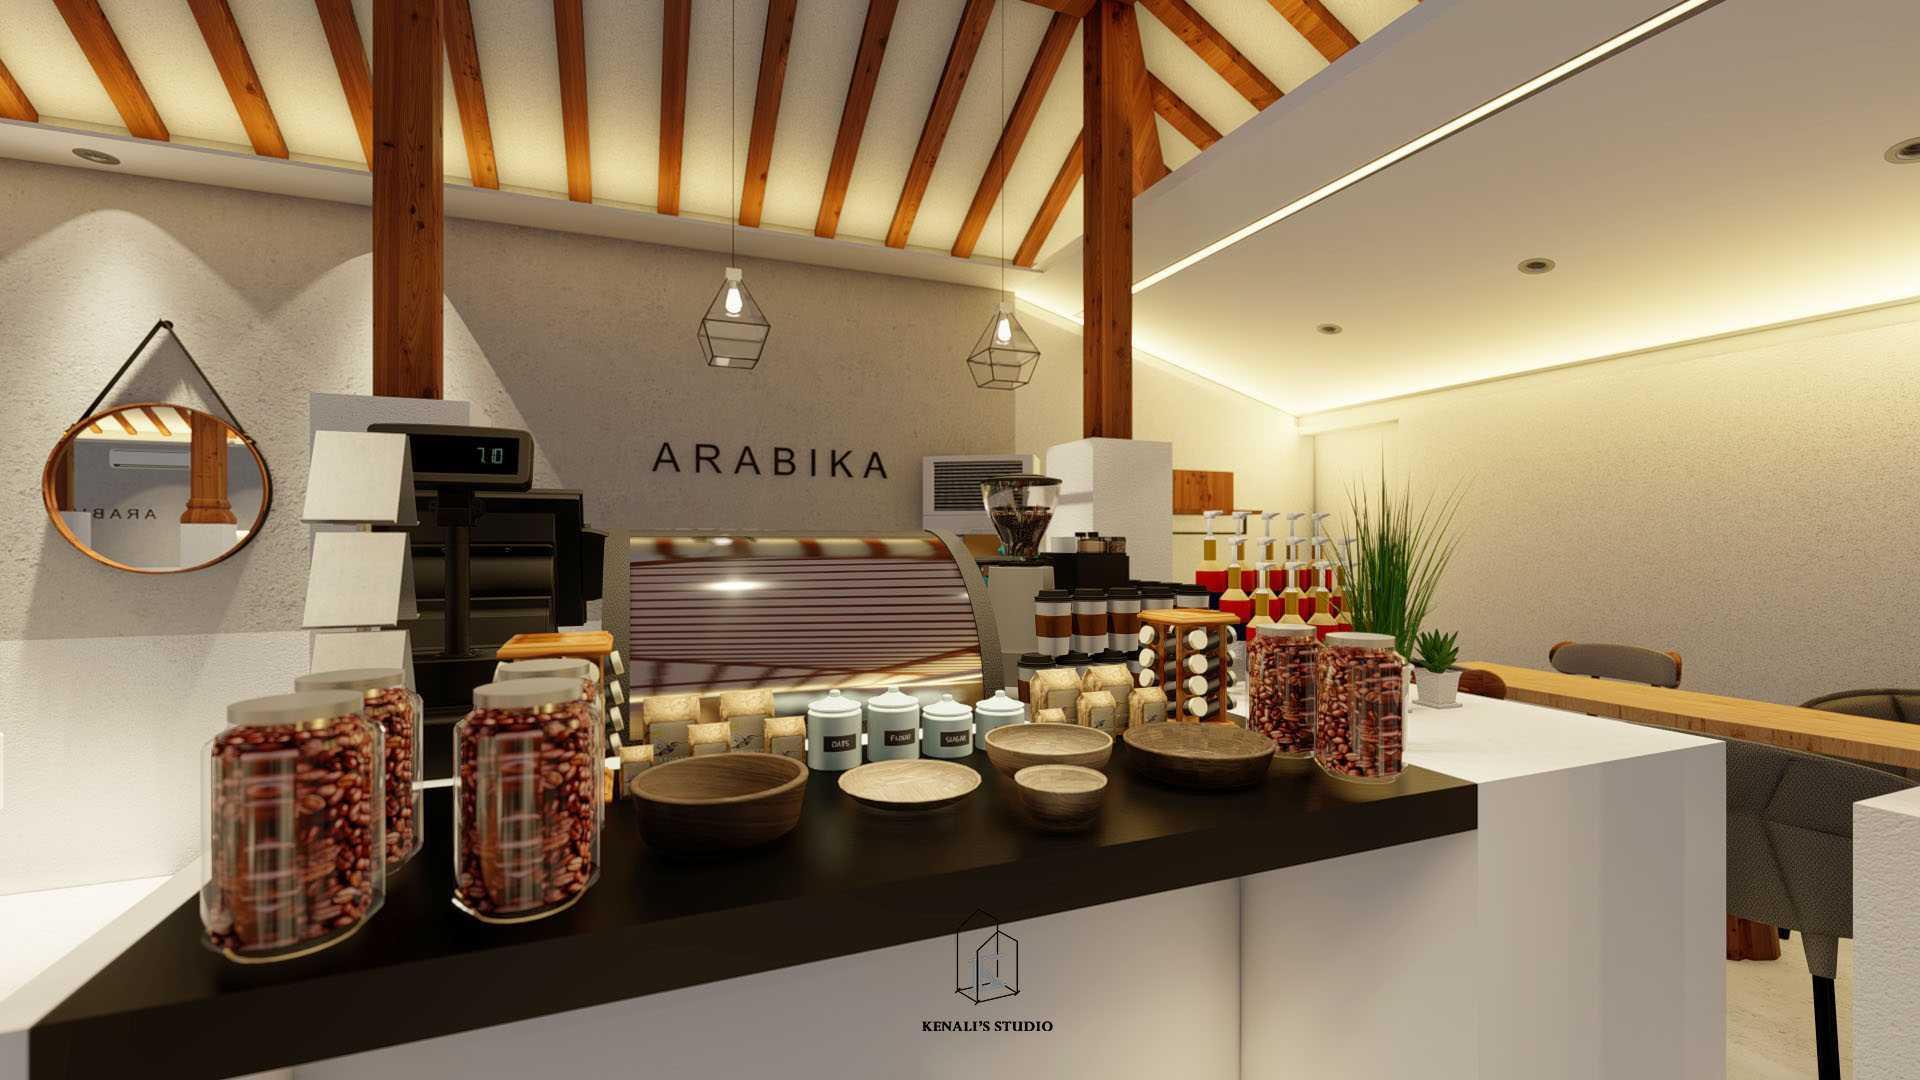 Kenali's Studio Arabika Cafe Semarang, Kota Semarang, Jawa Tengah, Indonesia Semarang, Kota Semarang, Jawa Tengah, Indonesia Kenalis-Studio-Arabika-Cafe Scandinavian  93653